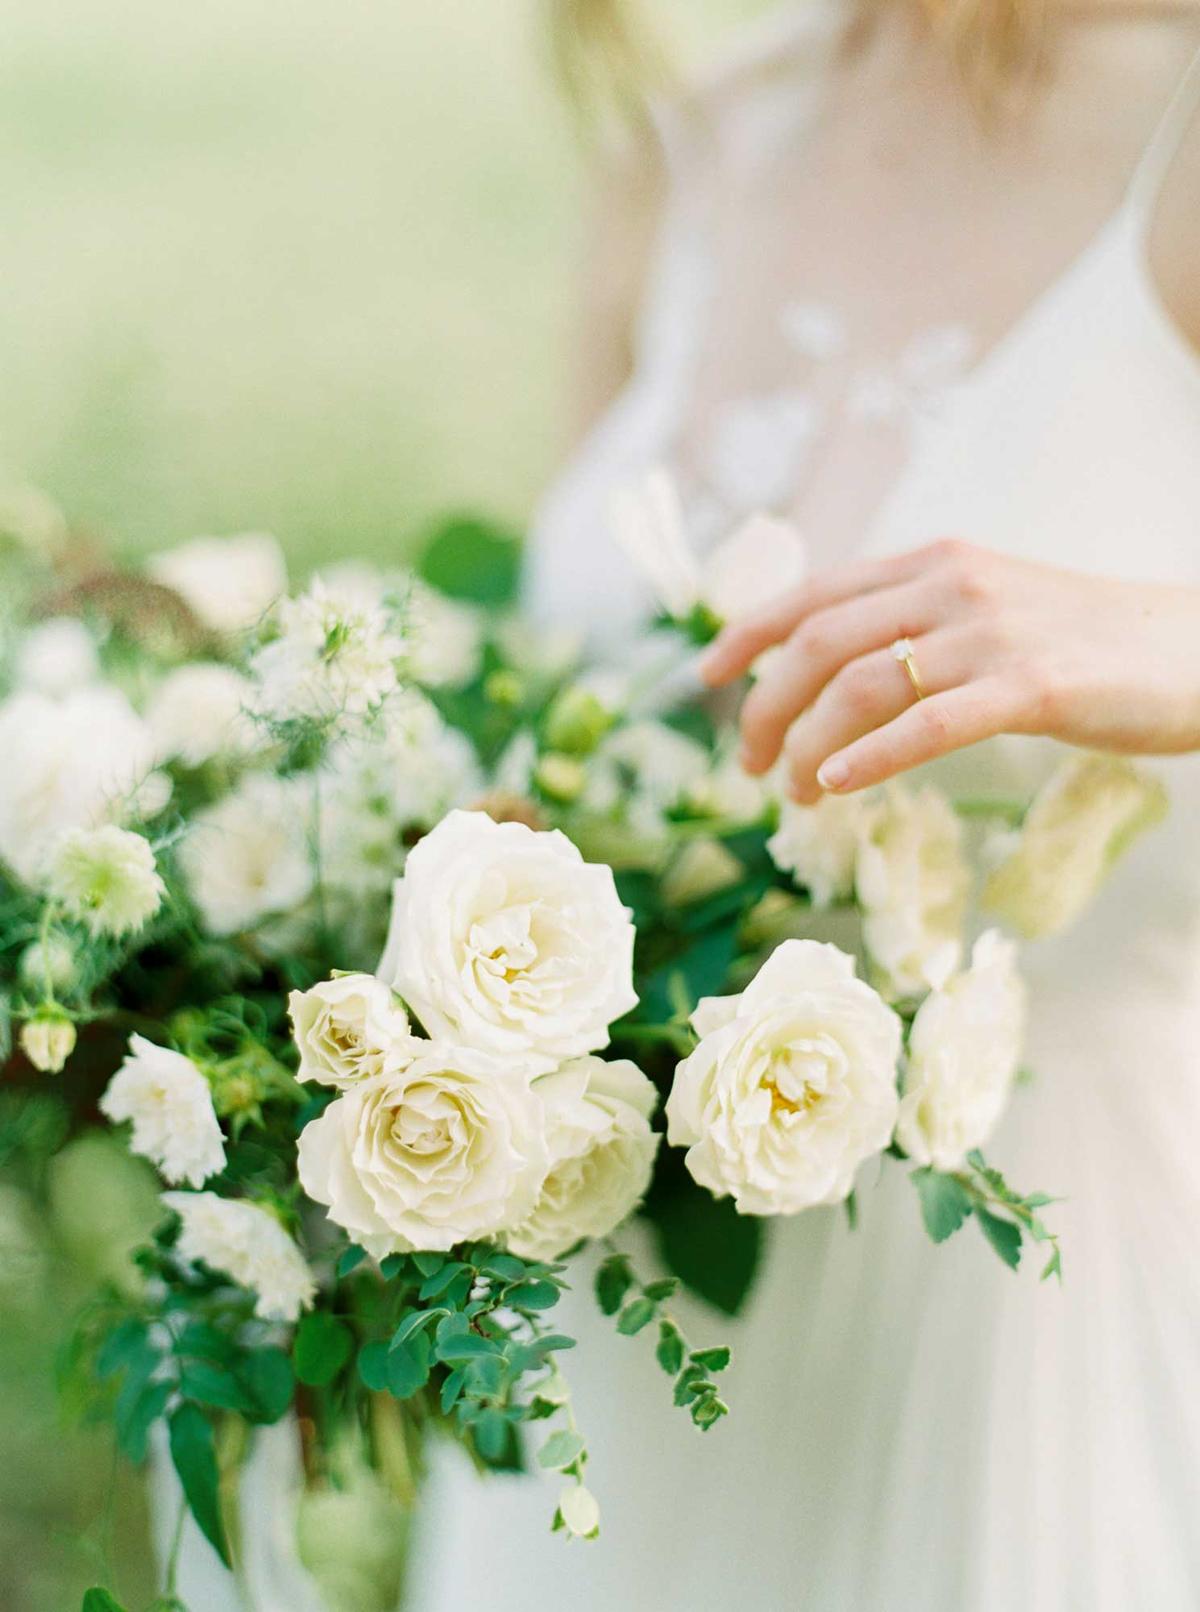 kayla-yestal-vineyard-bride-swish-list-woodland-weddings-niagara-wedding-editorial-42.jpg